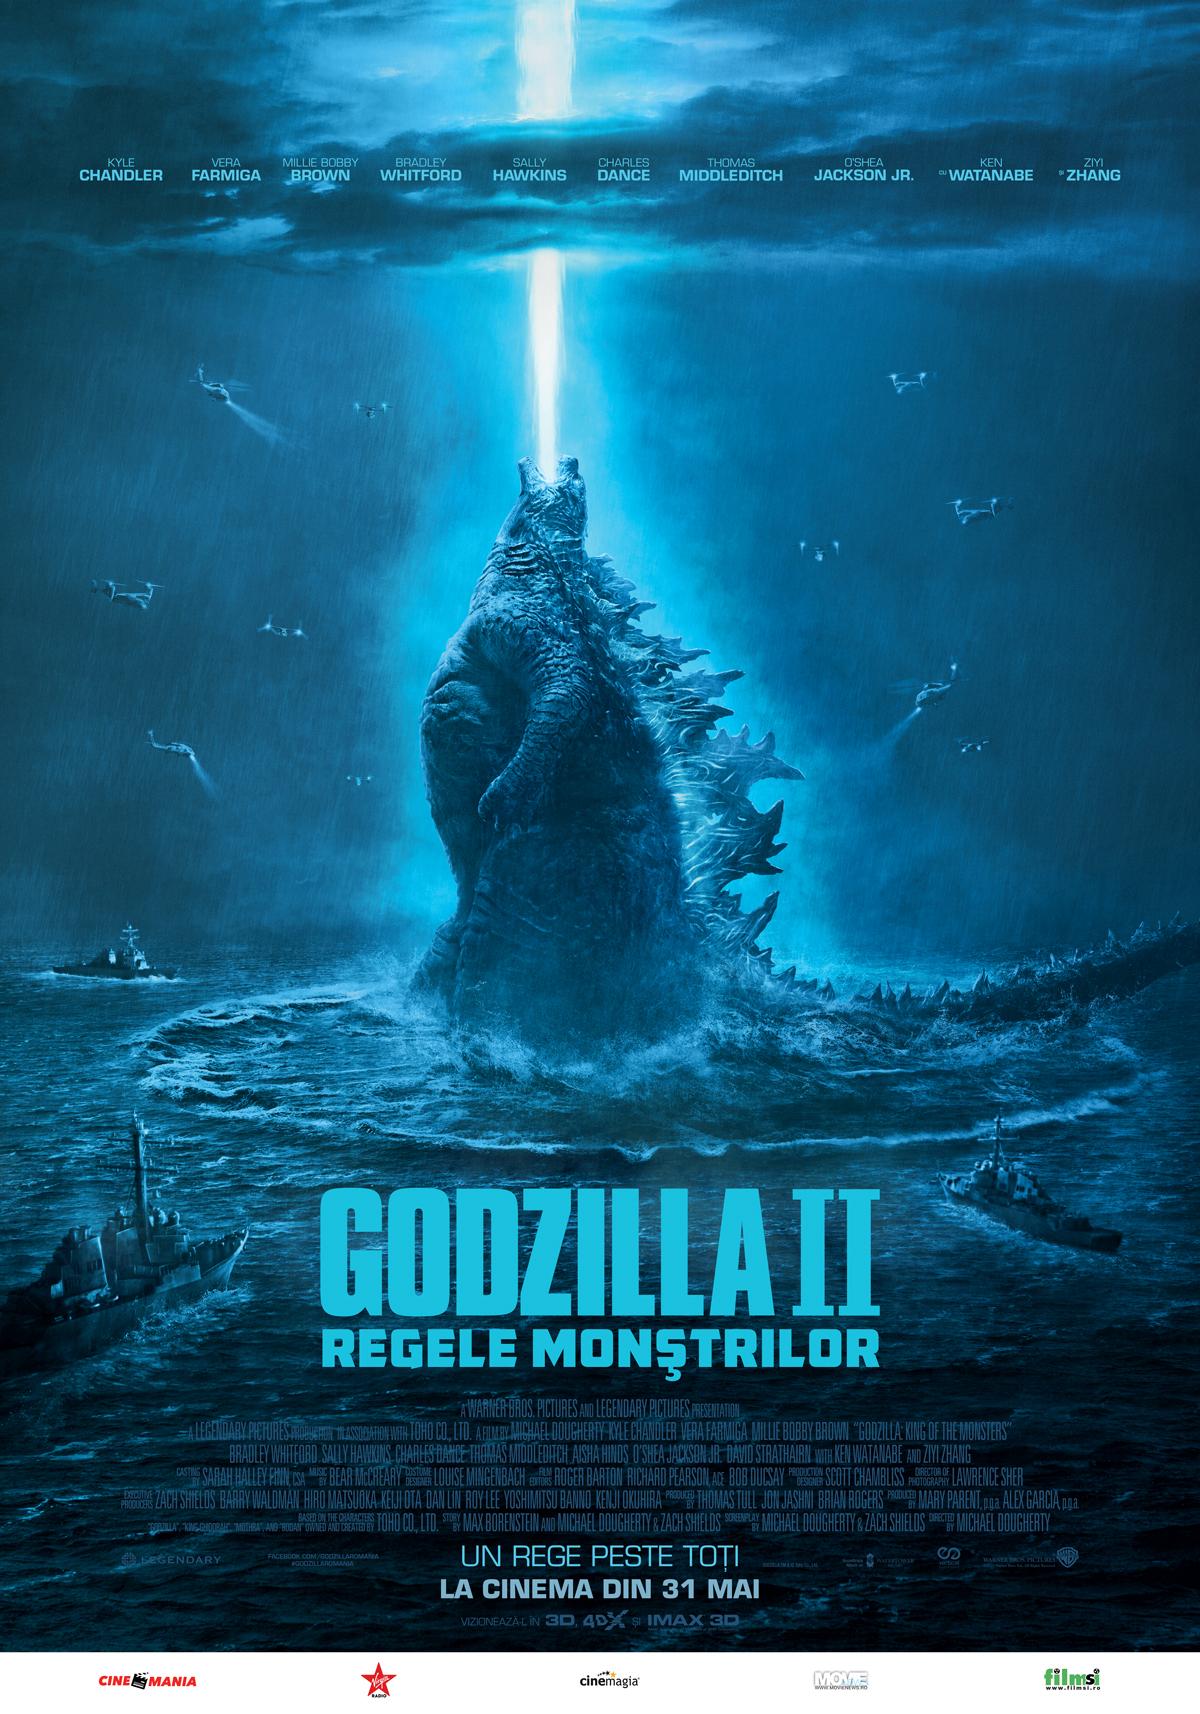 stirile industriei filmului de animatie Stirile industriei filmului de animatie Godzilla MainPoster 70x100cm IMAX preview